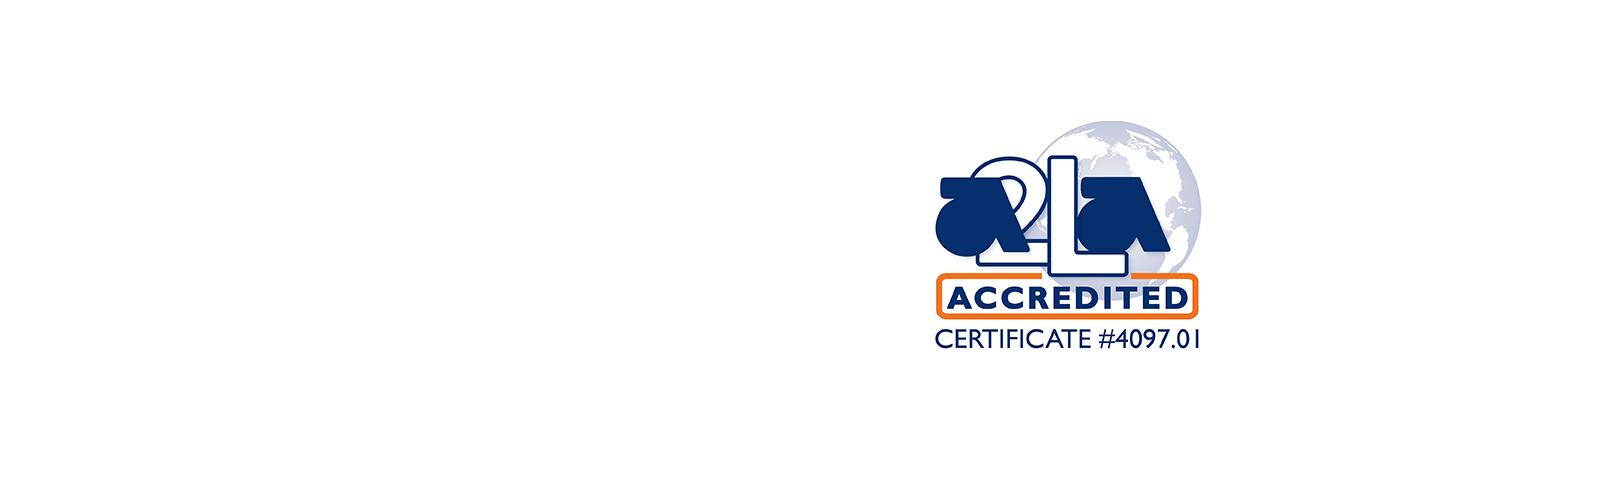 Certifications A2LA